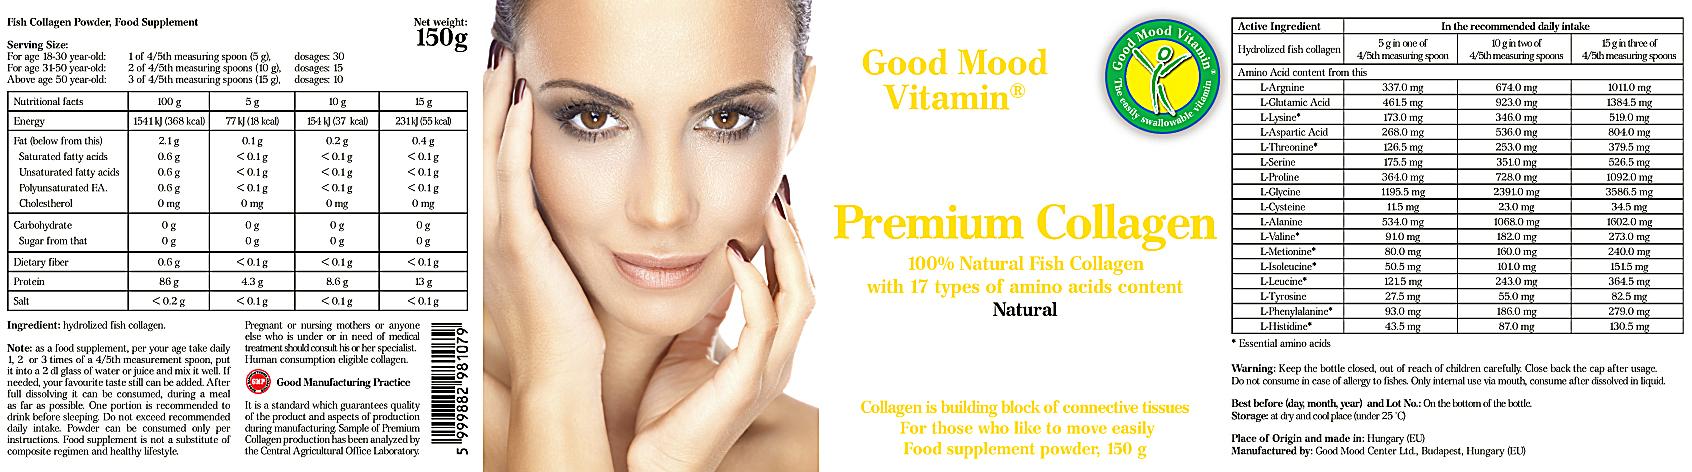 collagen supplement before after